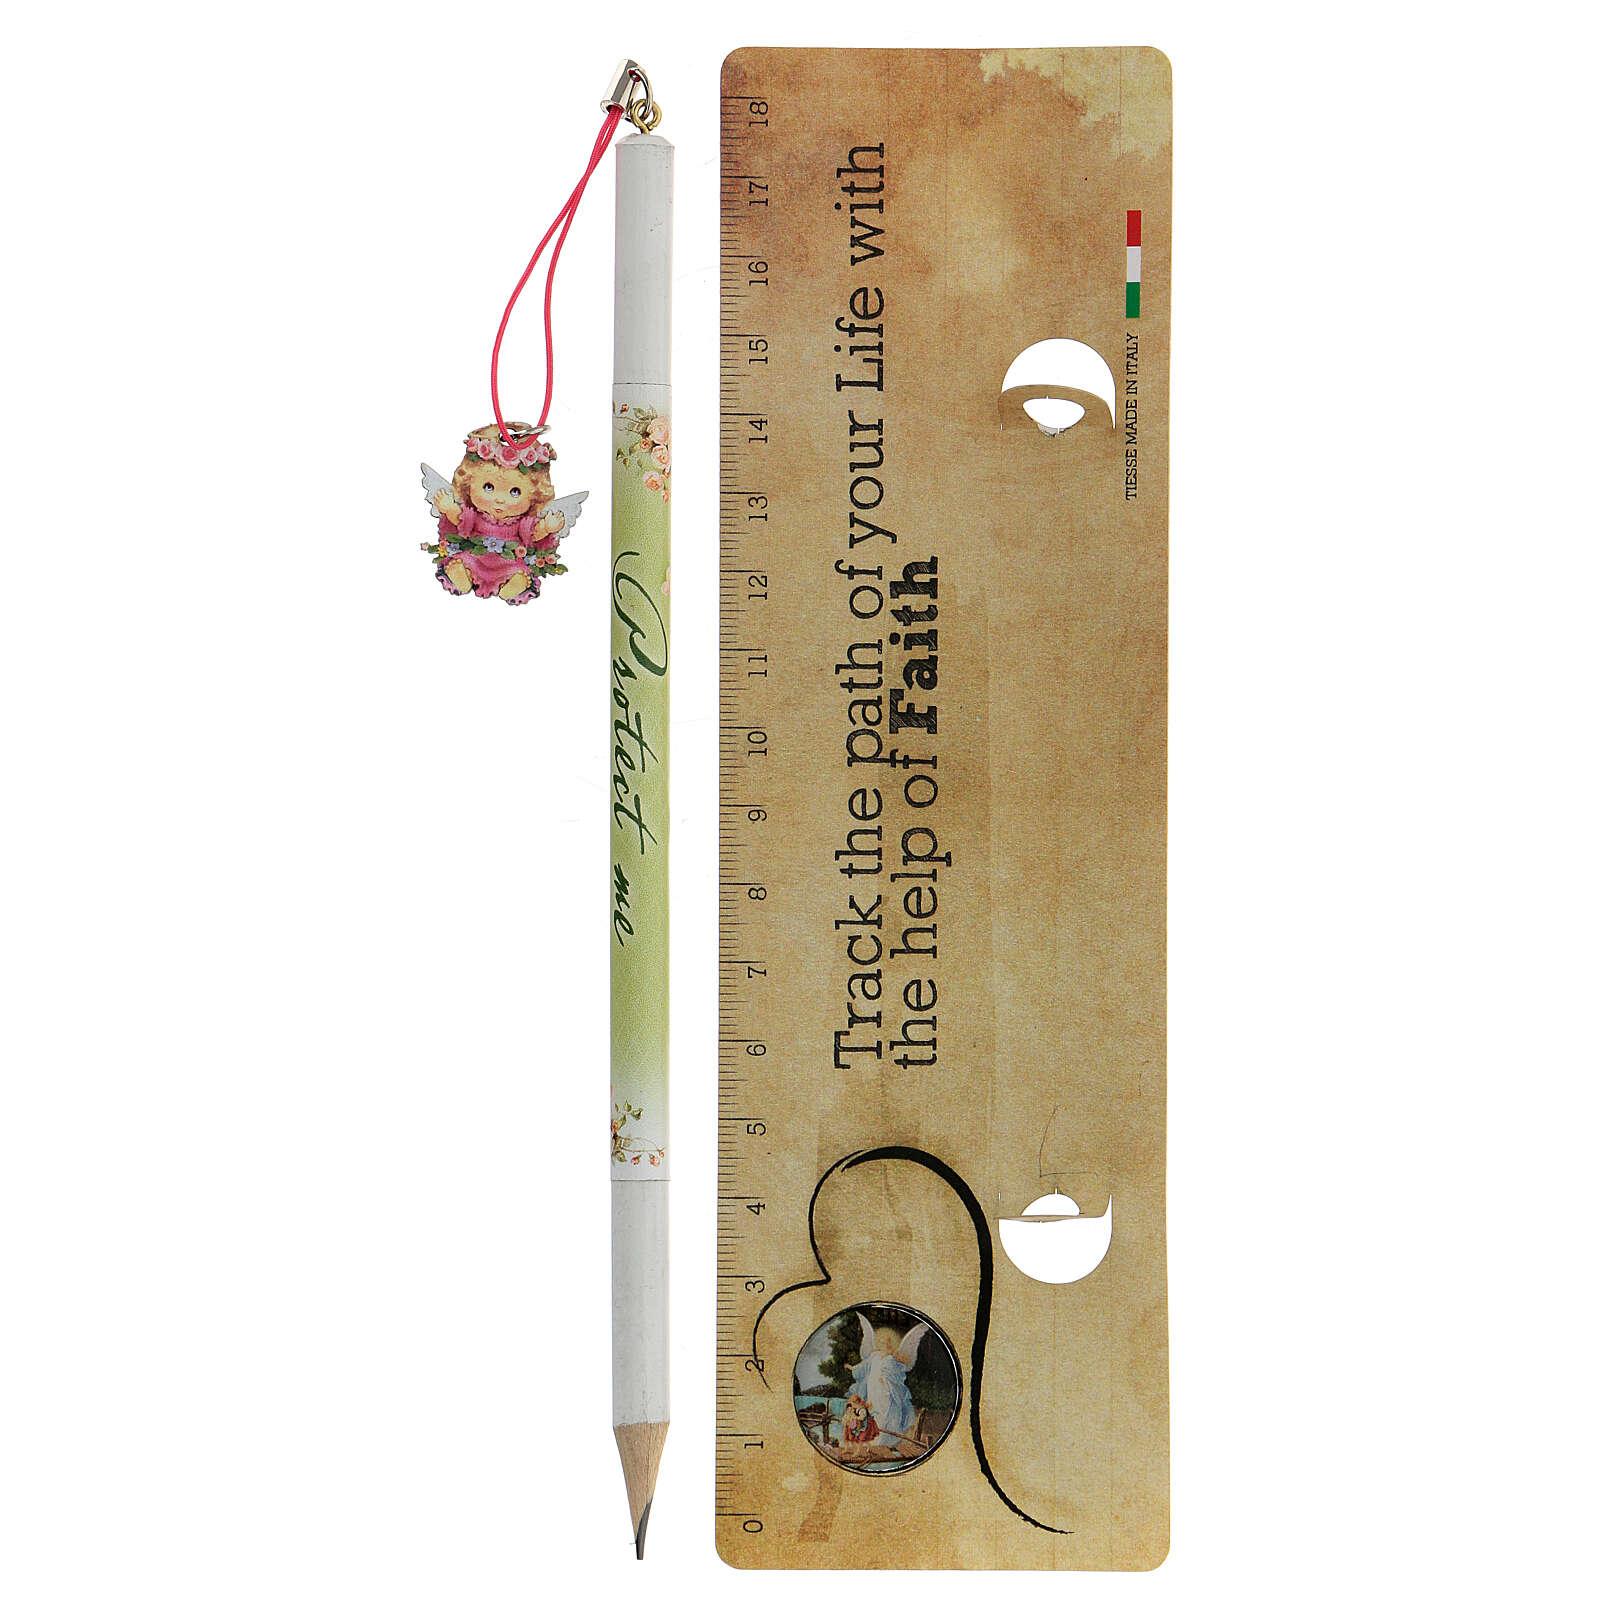 Souvenir rose crayon et règle ANGLAIS 3